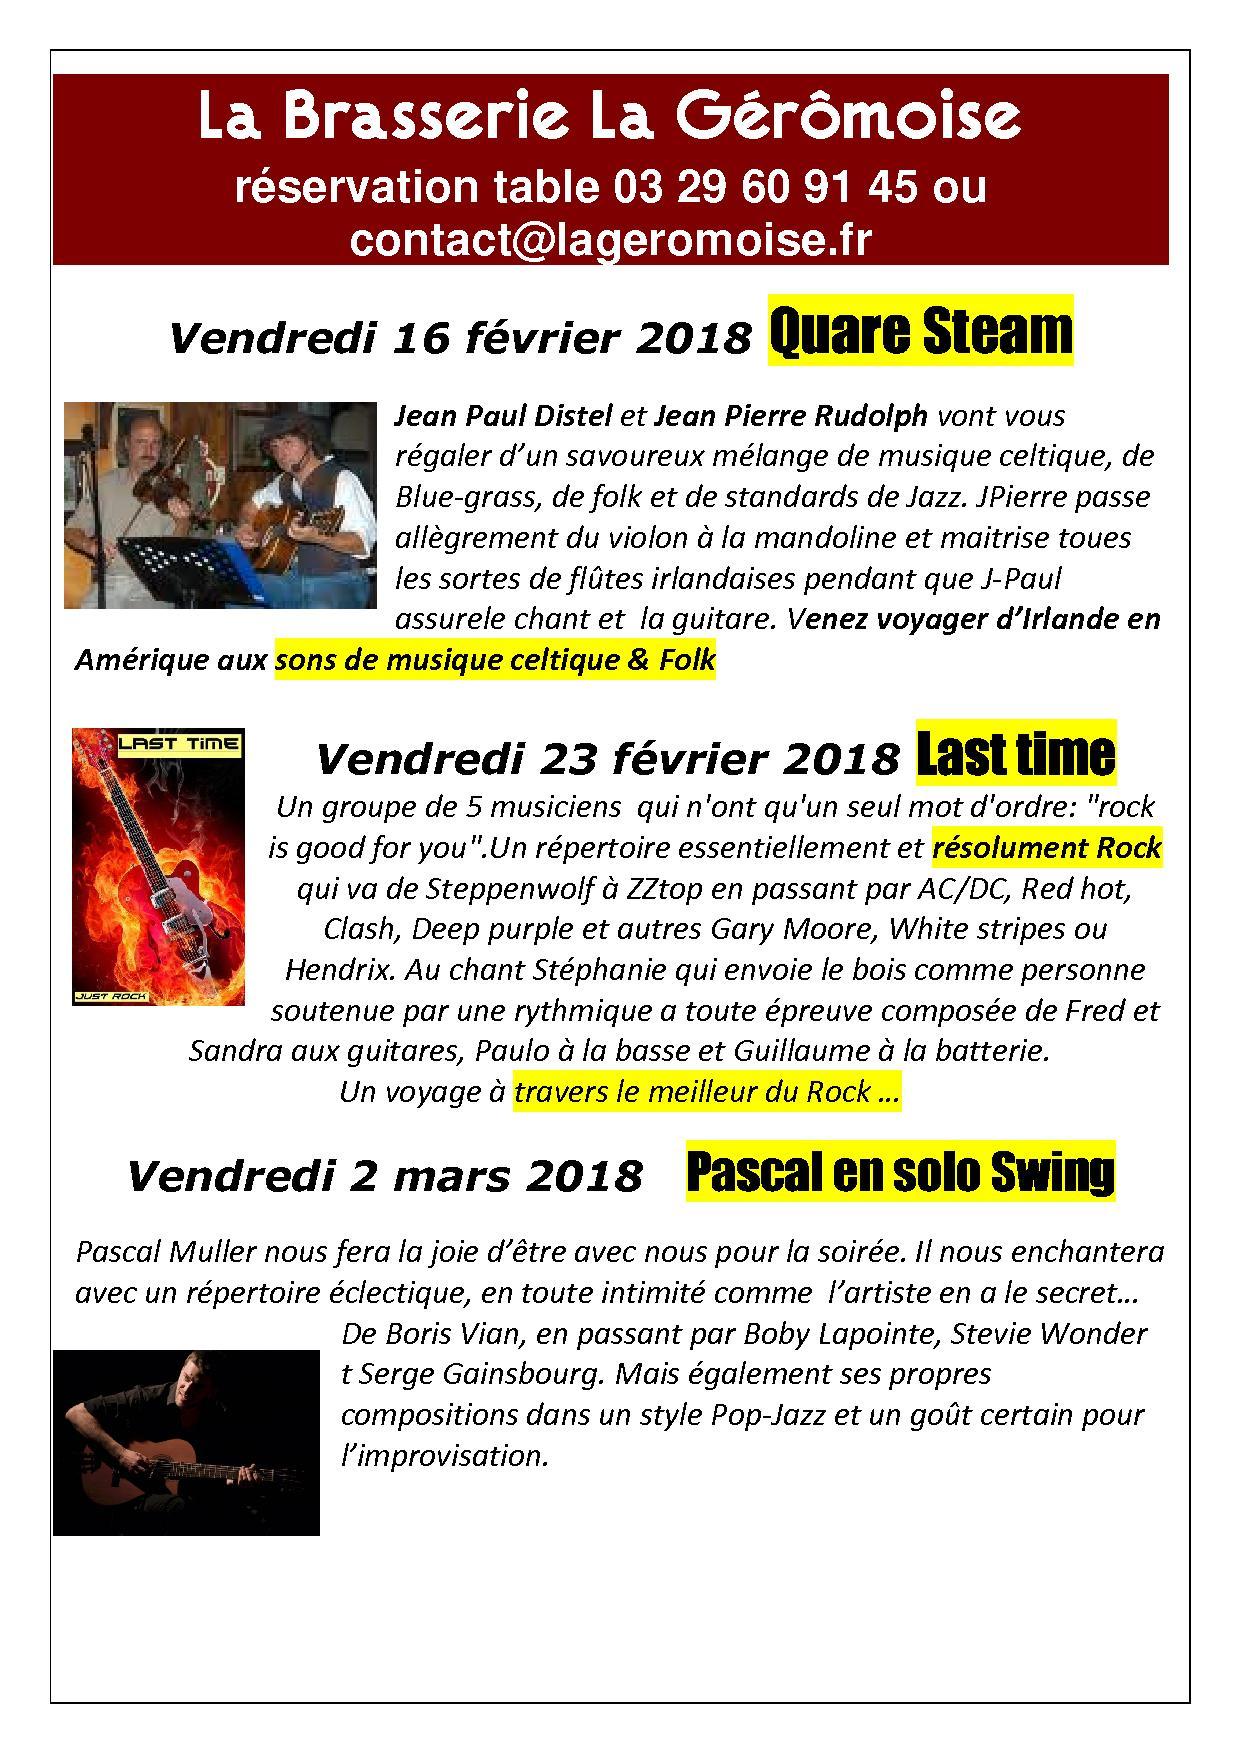 concerts-fev-mars-2018-quare-steam-last-time-pascal-muller.jpg